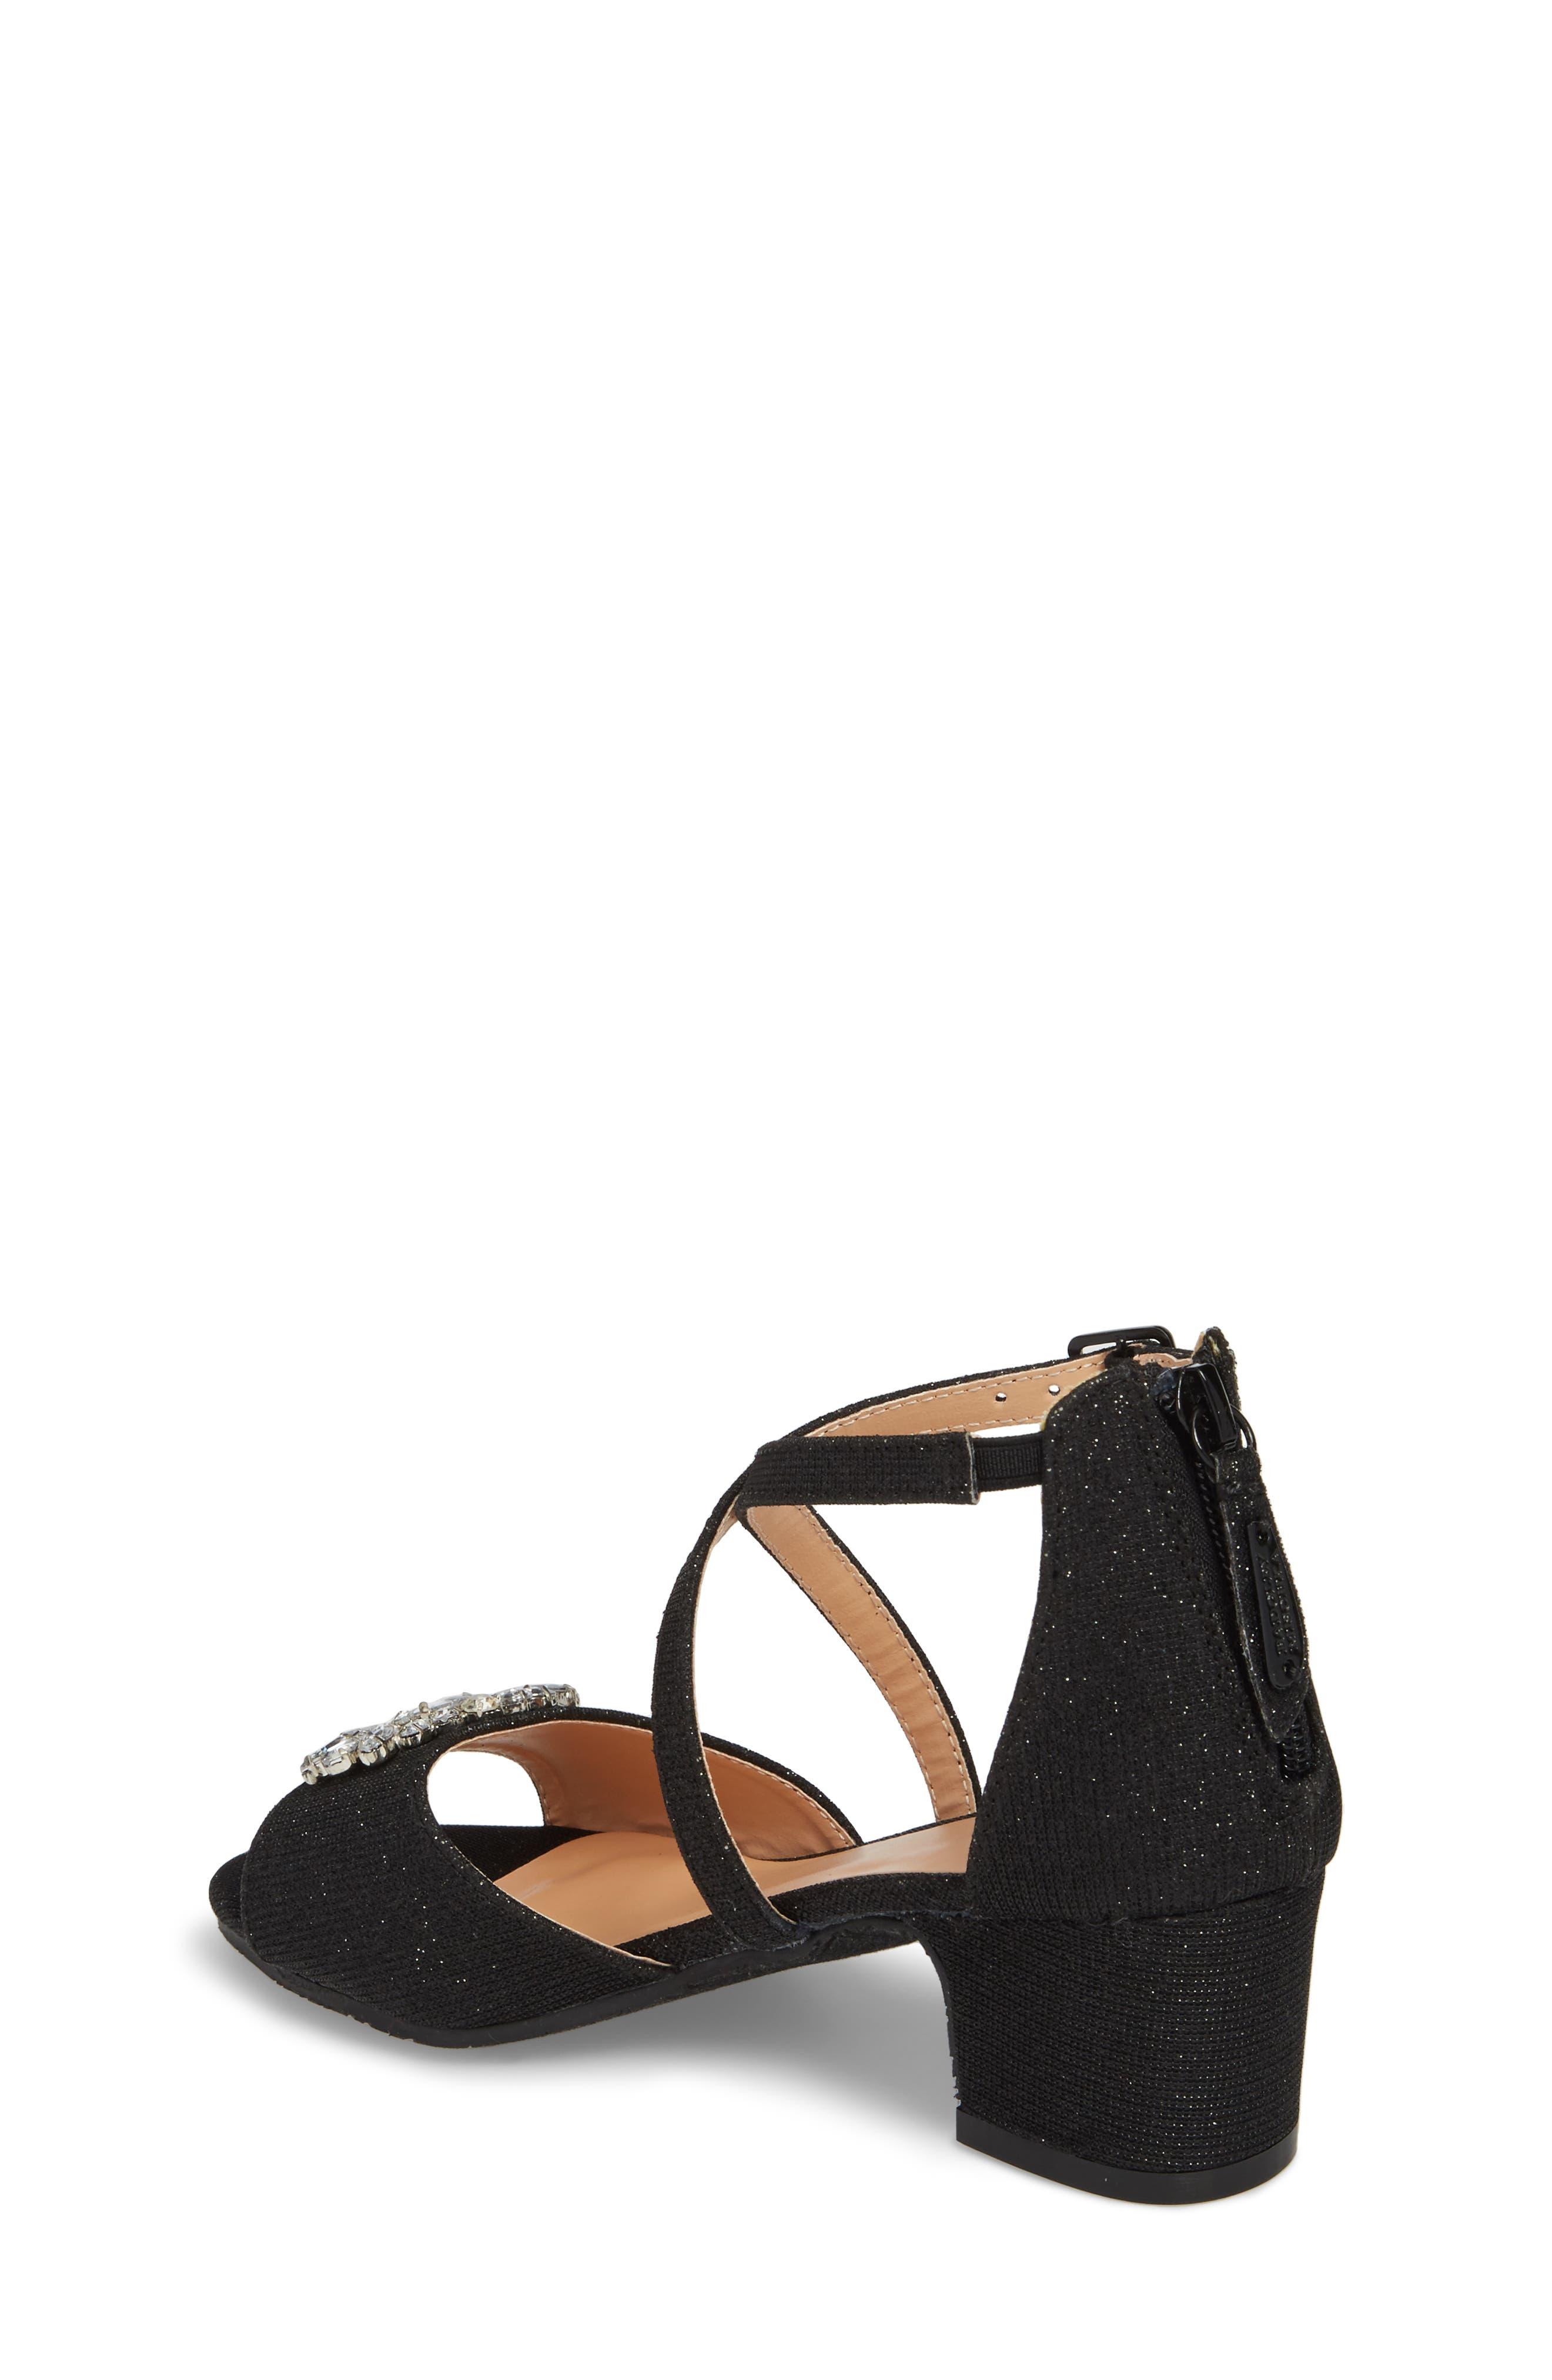 Pernia Gems Sandal,                             Alternate thumbnail 2, color,                             BLACK